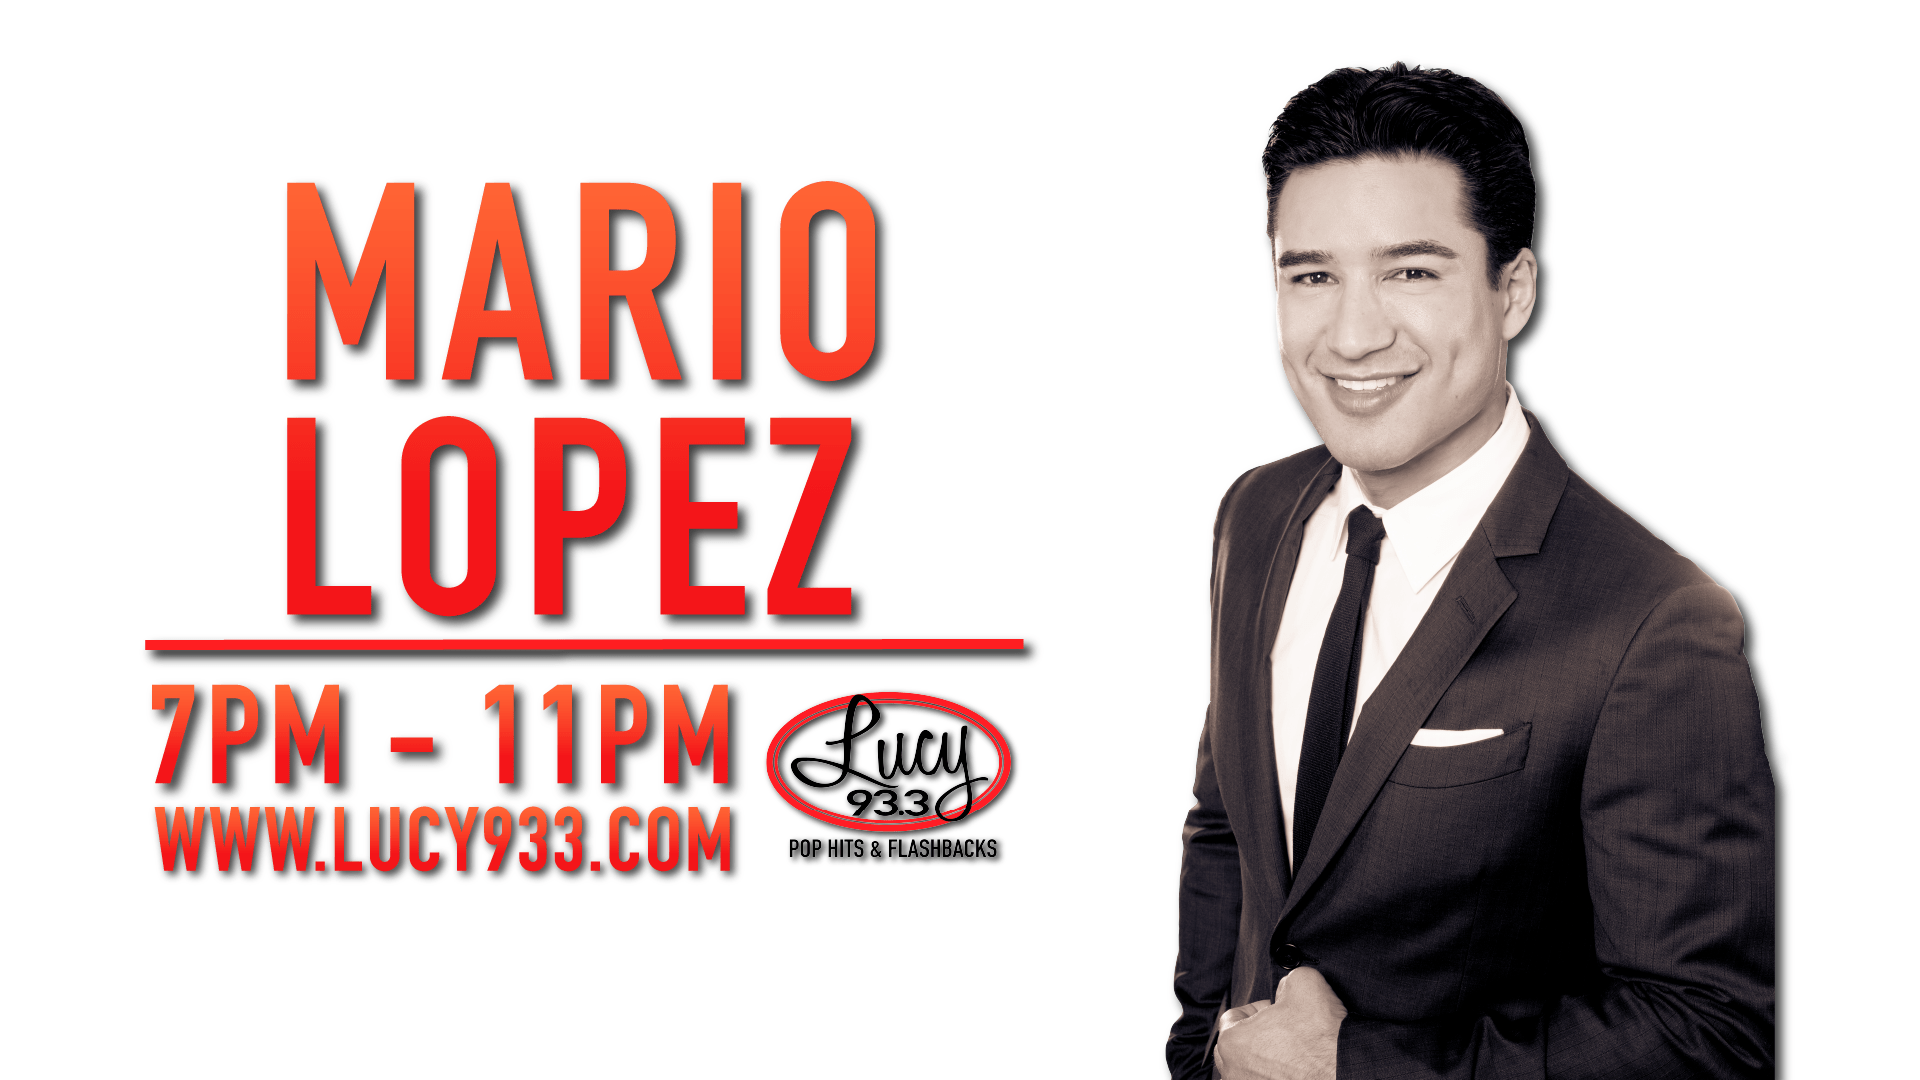 Mario Lopez 7pm-11pm Lucy933